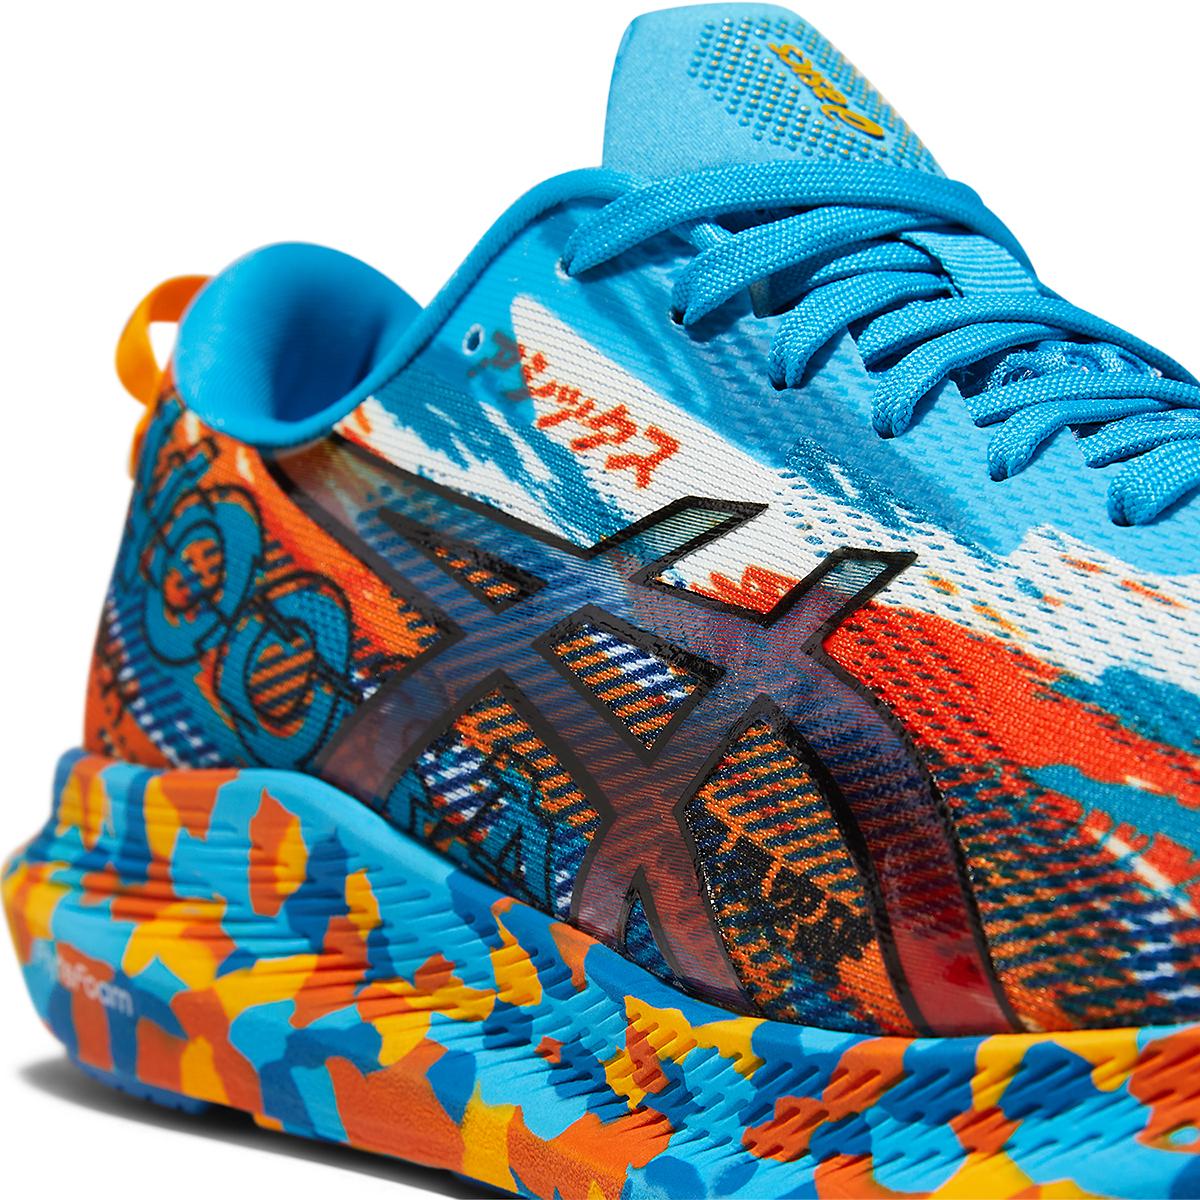 Men's Asics Noosa Tri 13 Running Shoe - Color: Digital Aqua/Ma - Size: 7 - Width: Regular, Digital Aqua/Ma, large, image 4